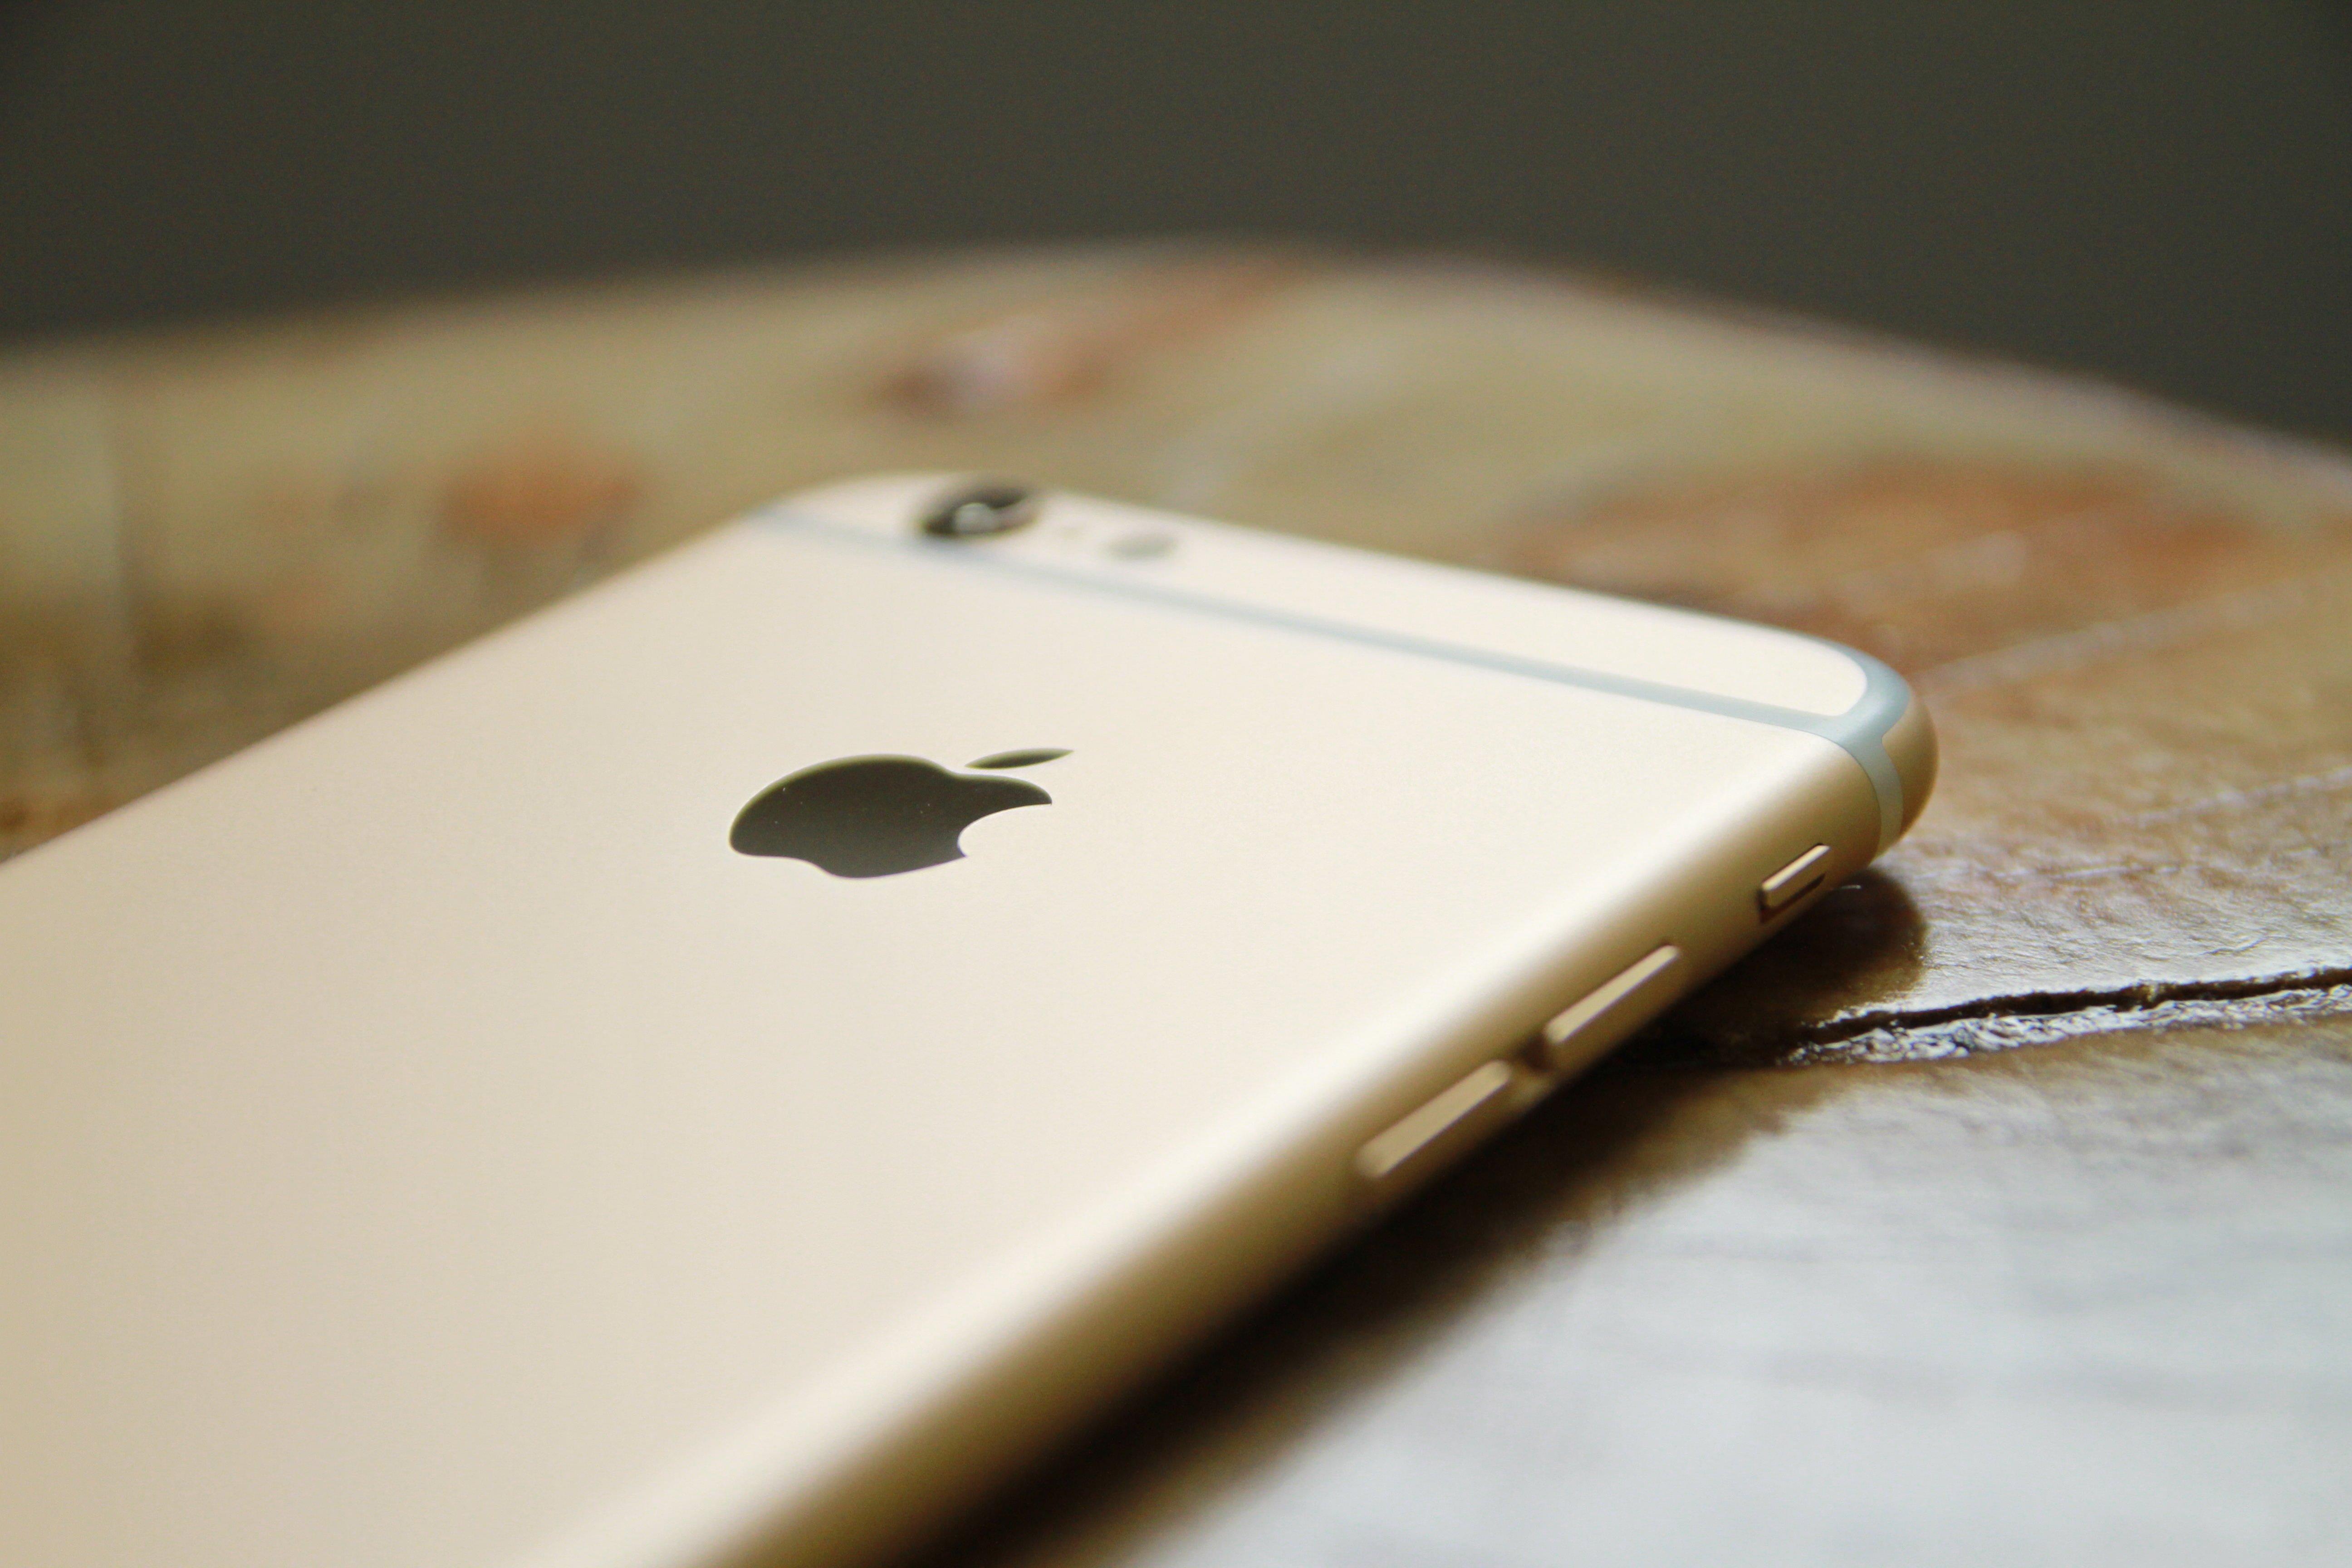 apple_smartphone